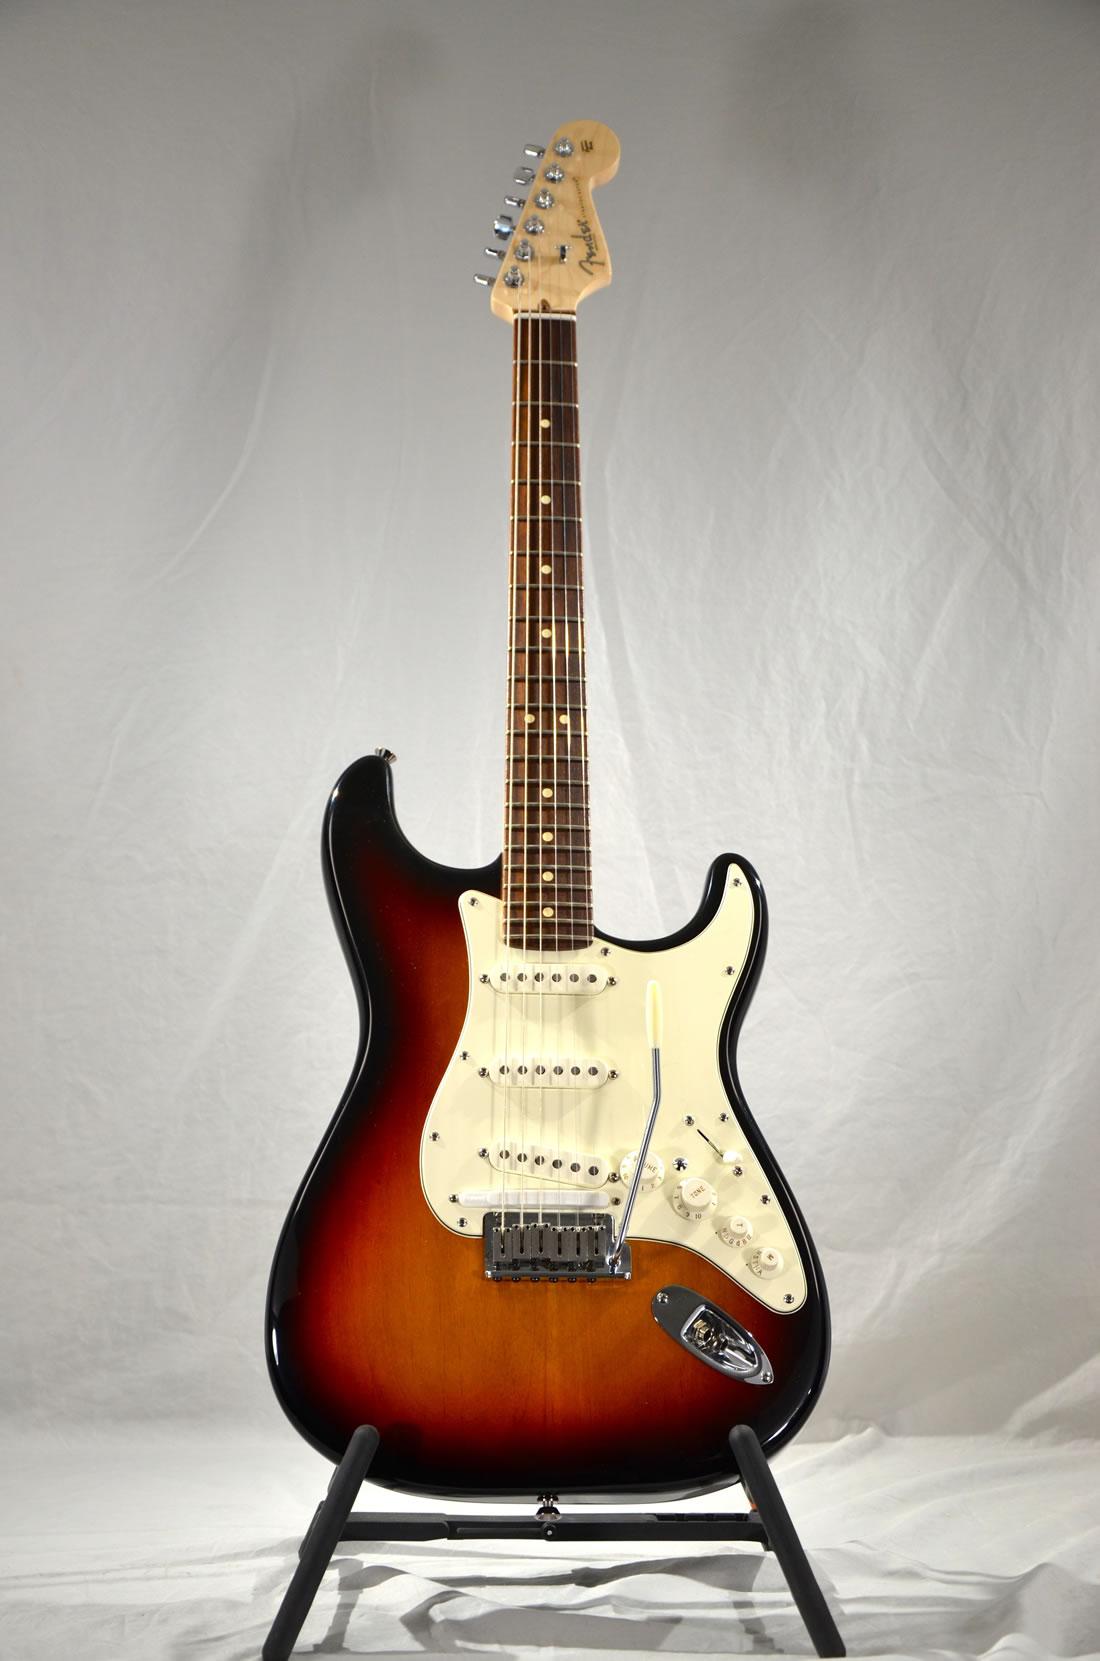 2007 Fender American Series VG Stratocaster Guitar